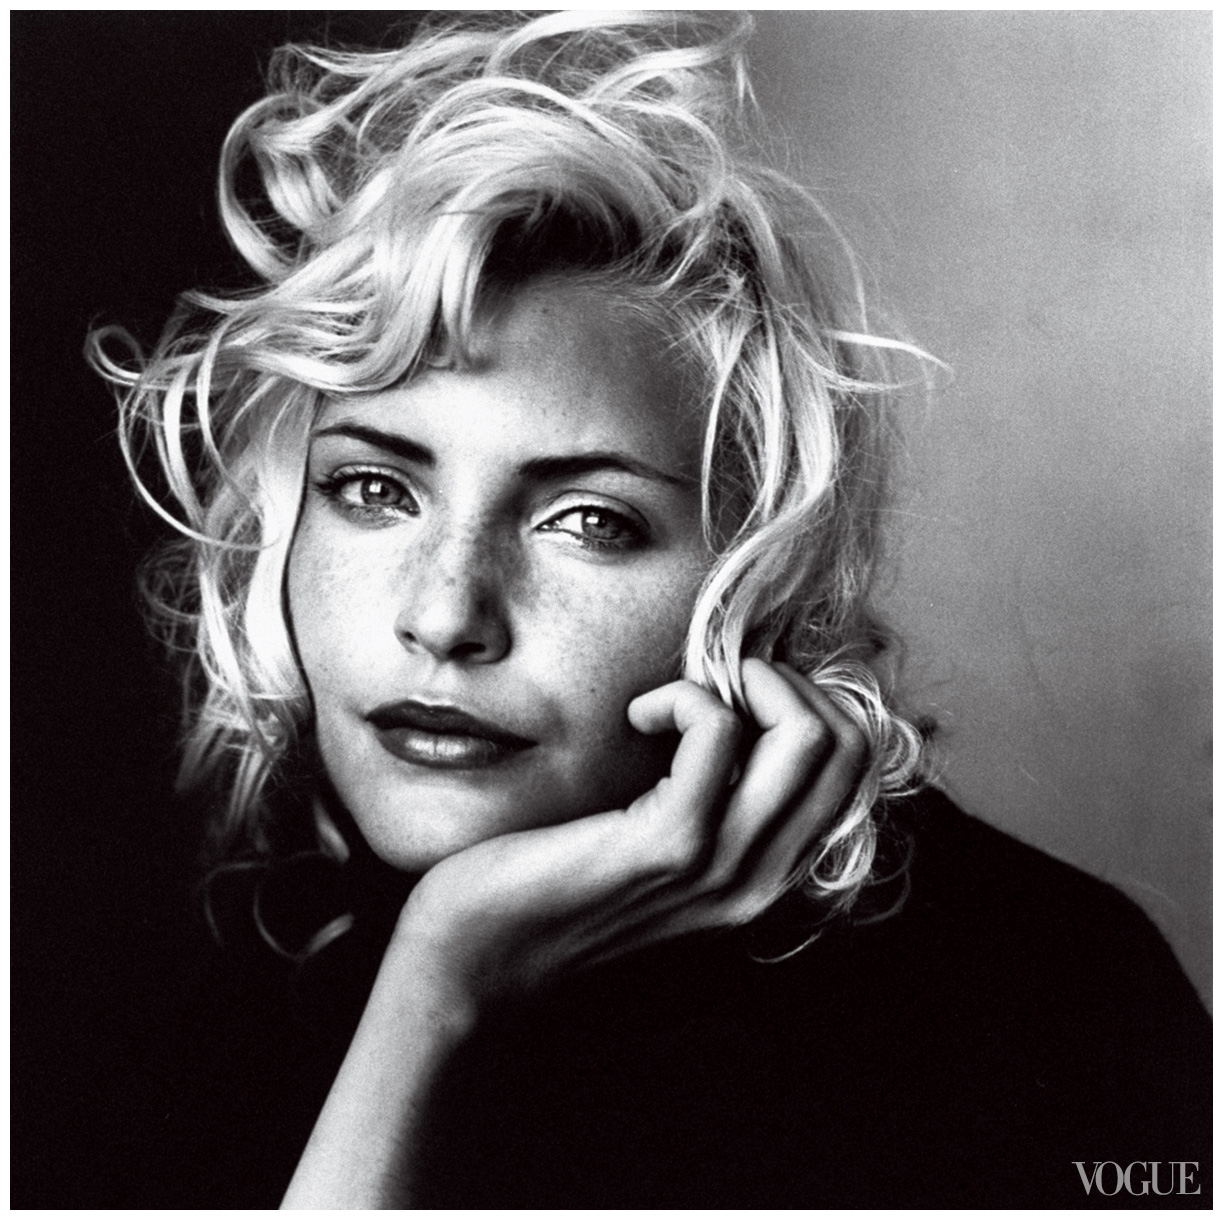 nadja-auermann-photo-irving-penn-vogue-july-1994.jpg